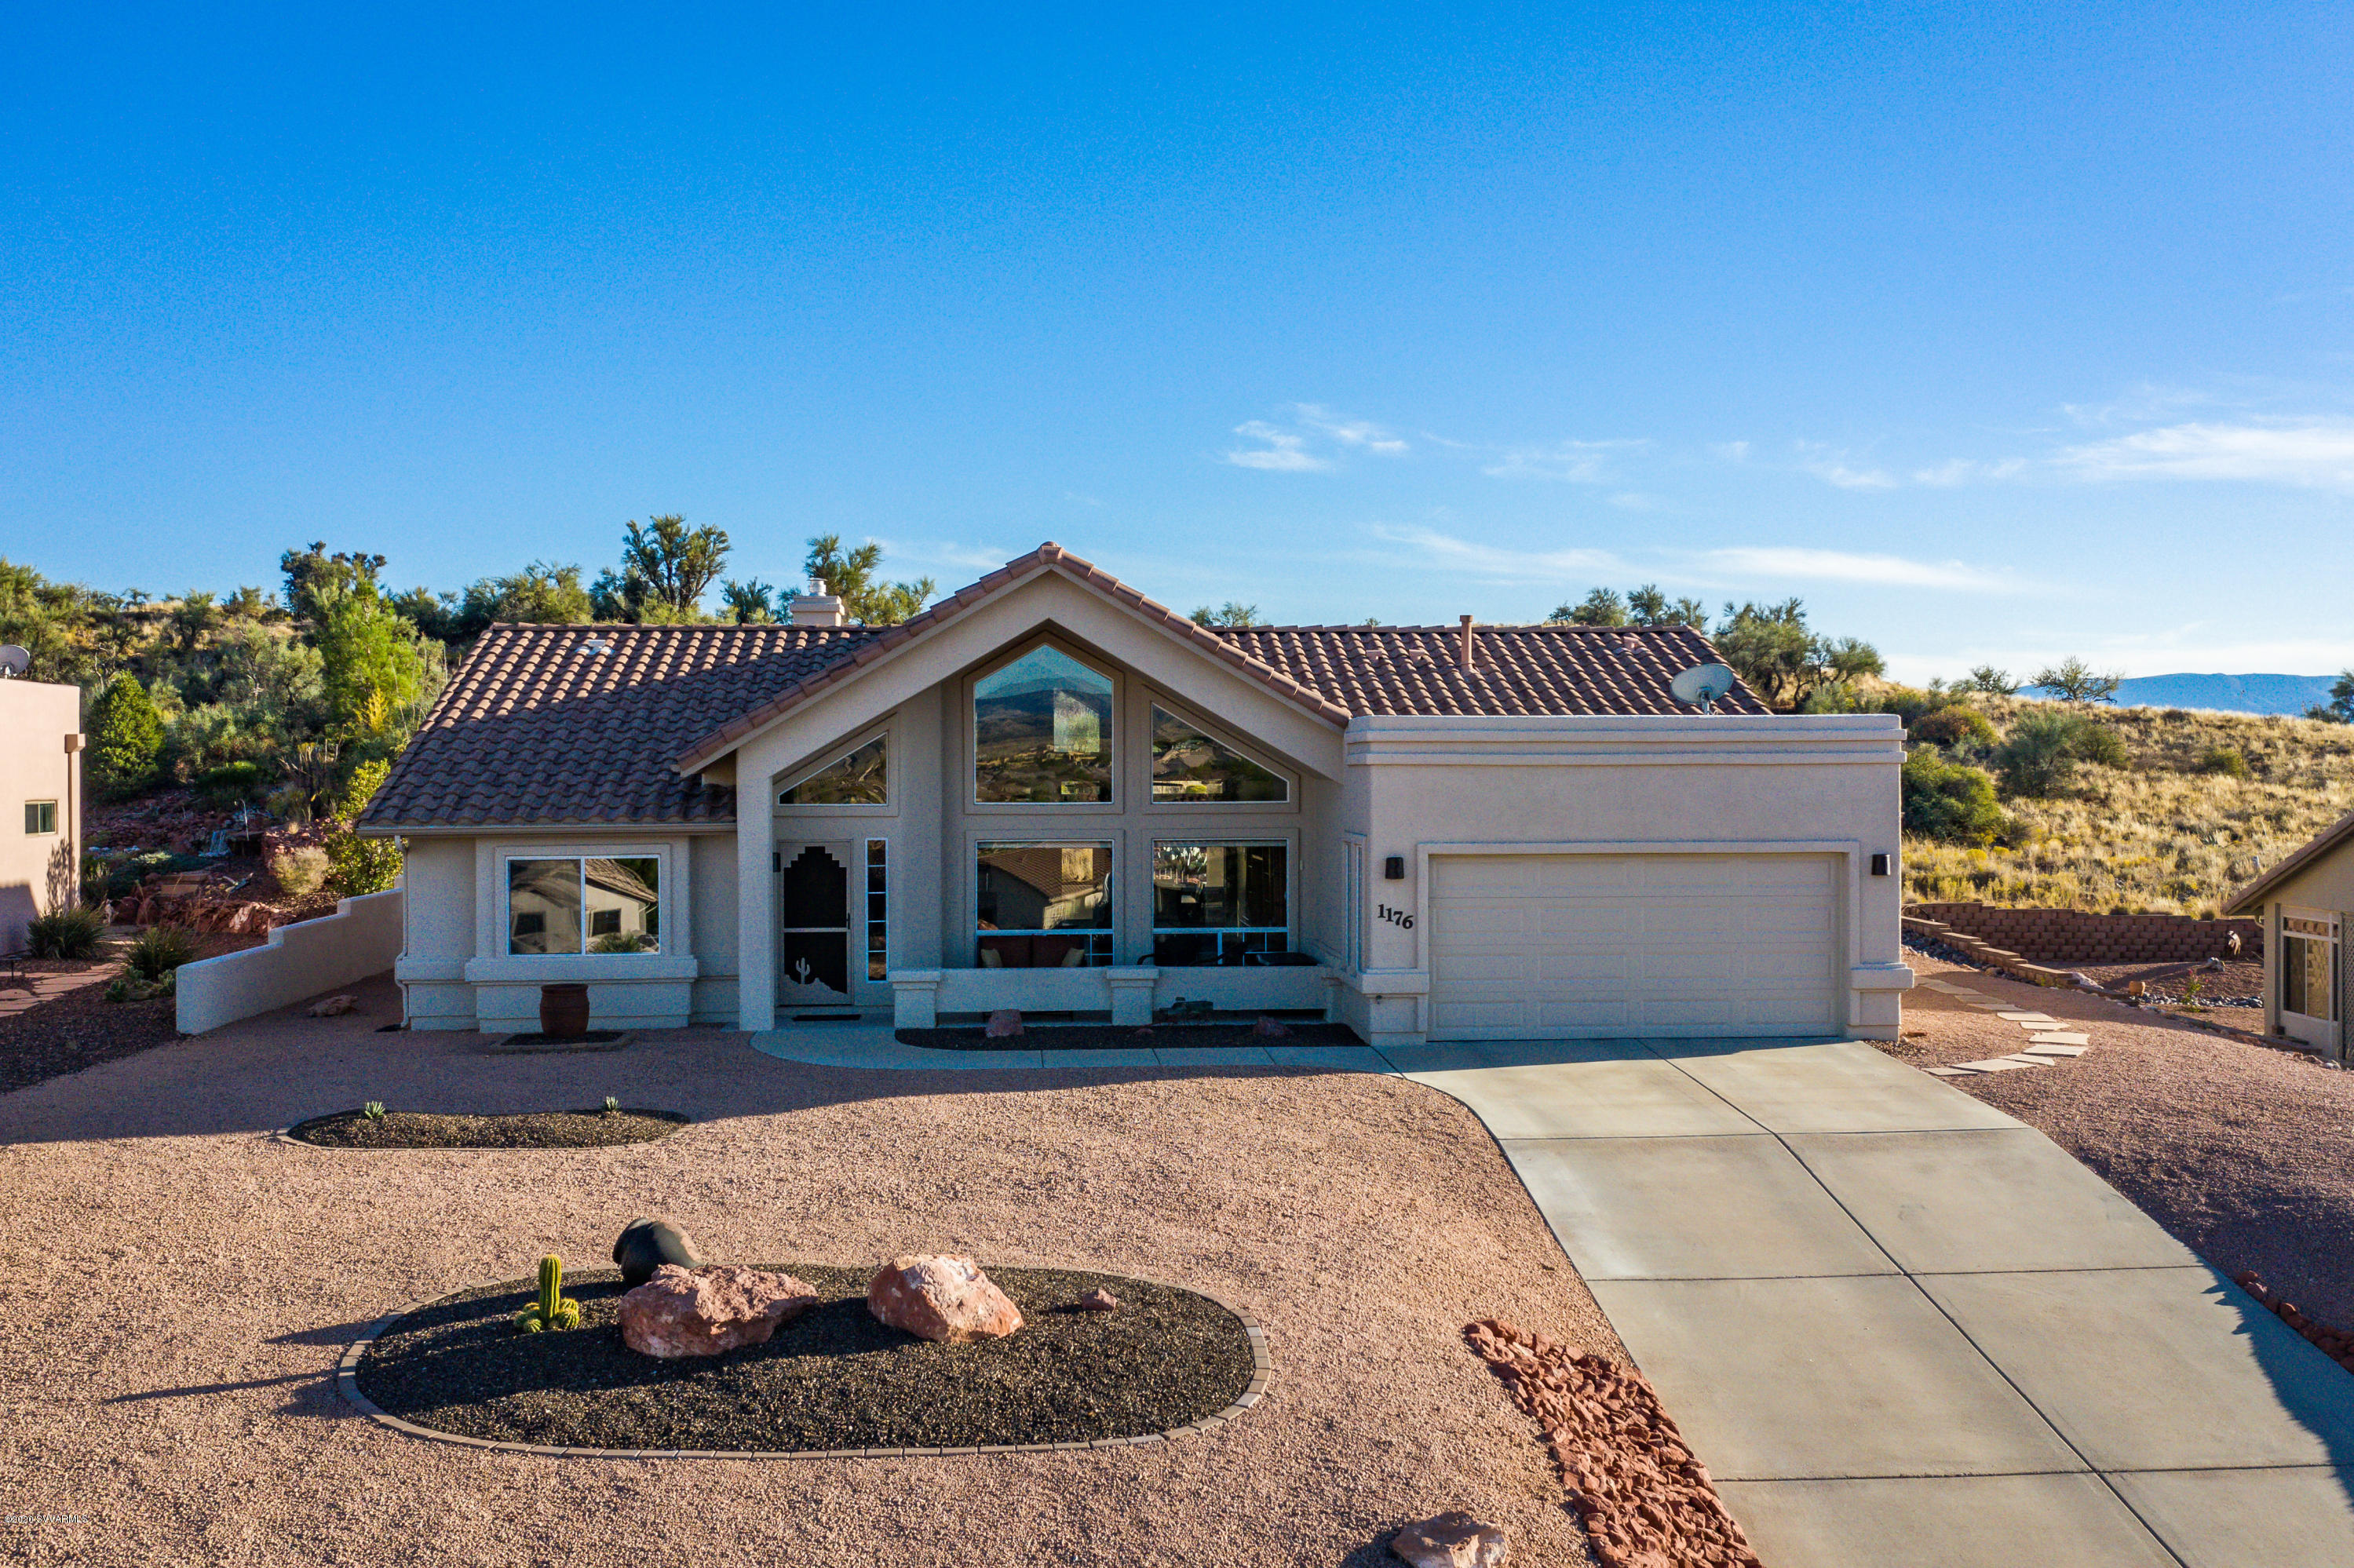 1176 S Verde Santa Fe Pkwy Cornville, AZ 86325